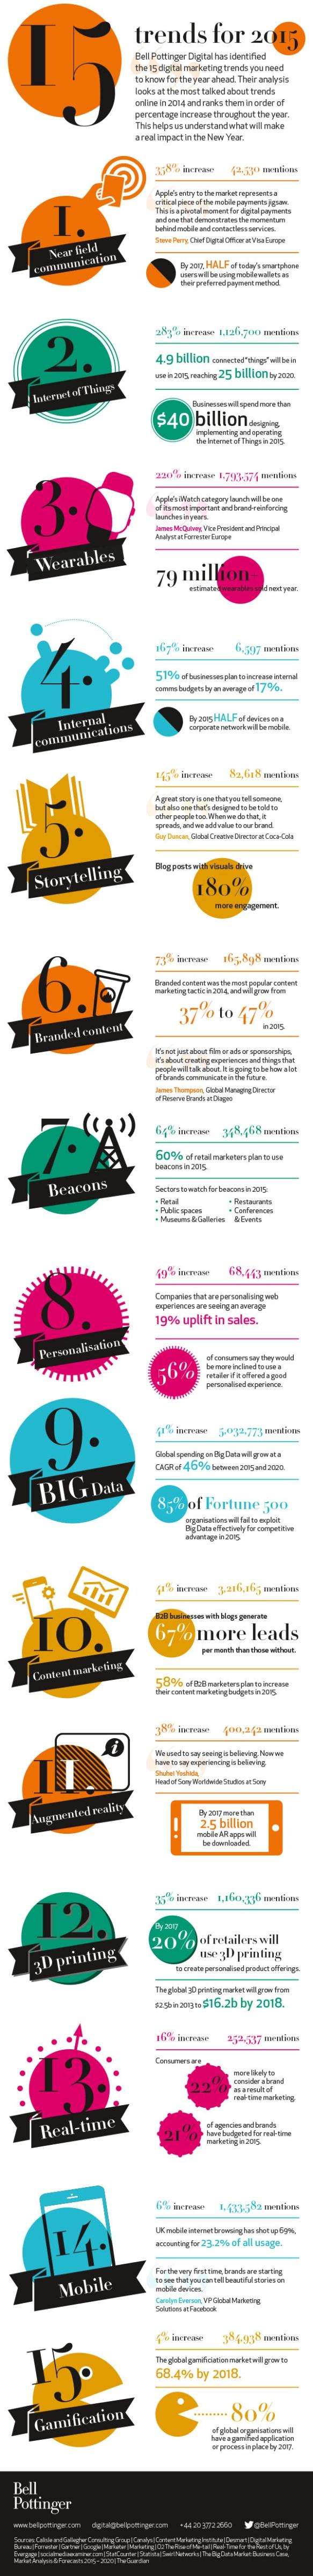 Bell-Pottinger-Digital-15-trends-for-2015-infographic